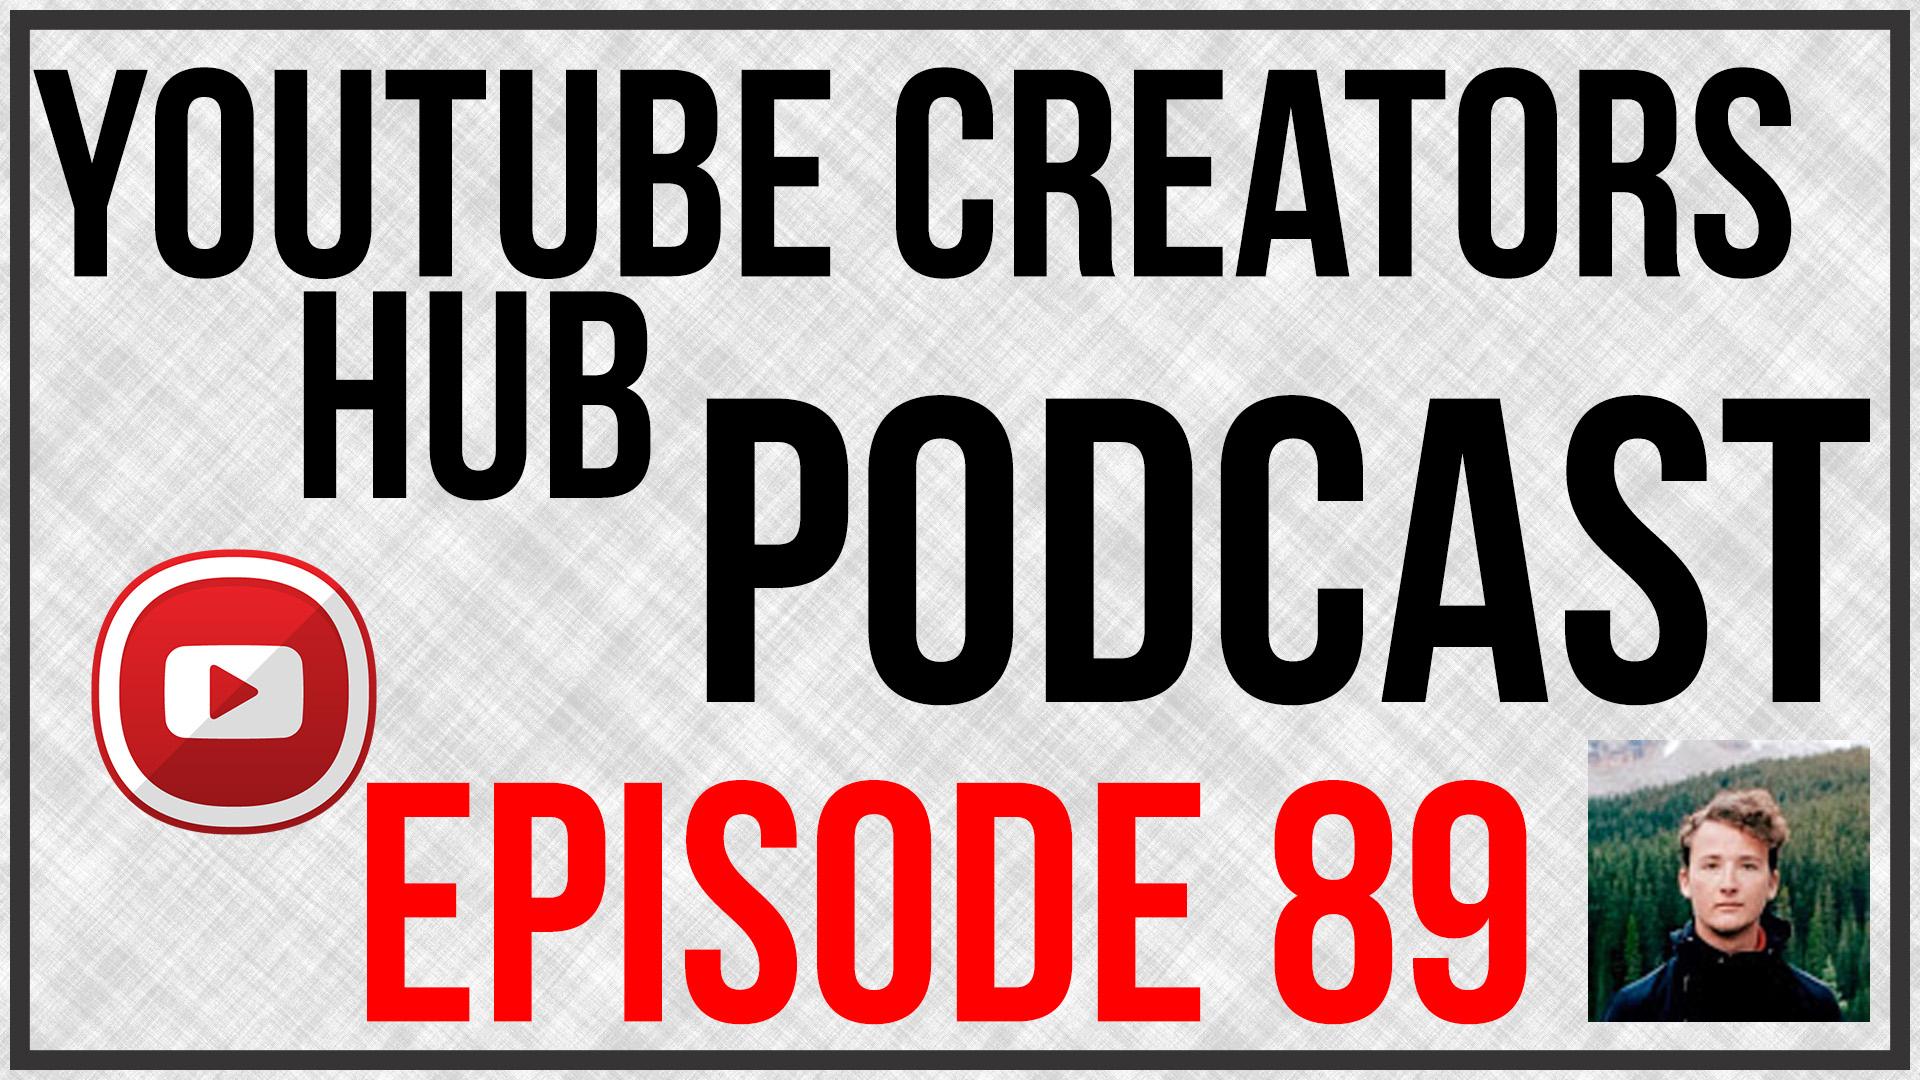 YouTube Creators Hub Podcast Episode 89